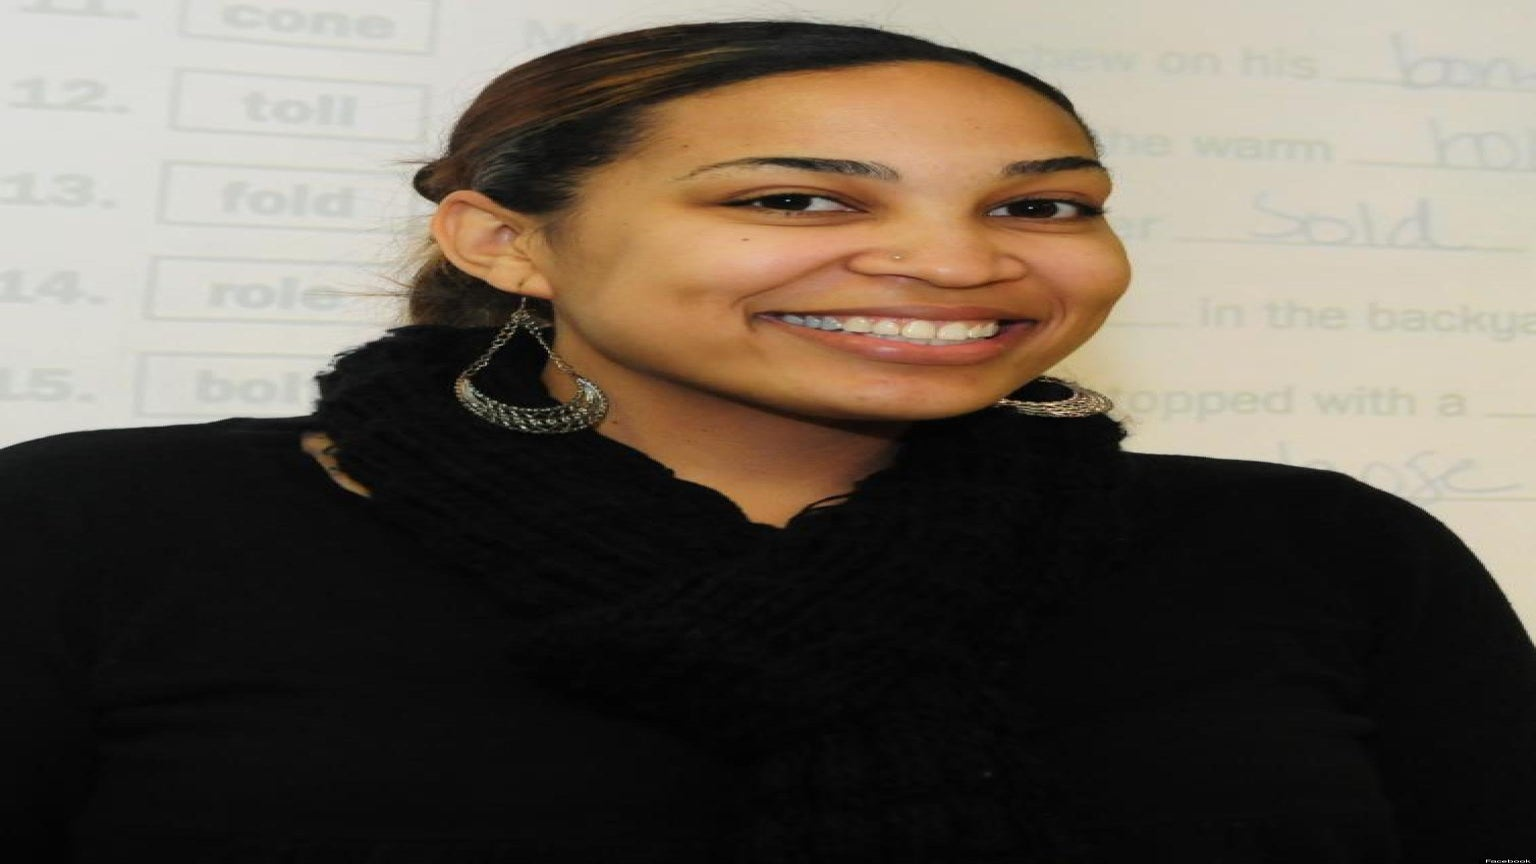 NOLA Authorities Identify Terrilynn Monette's Body